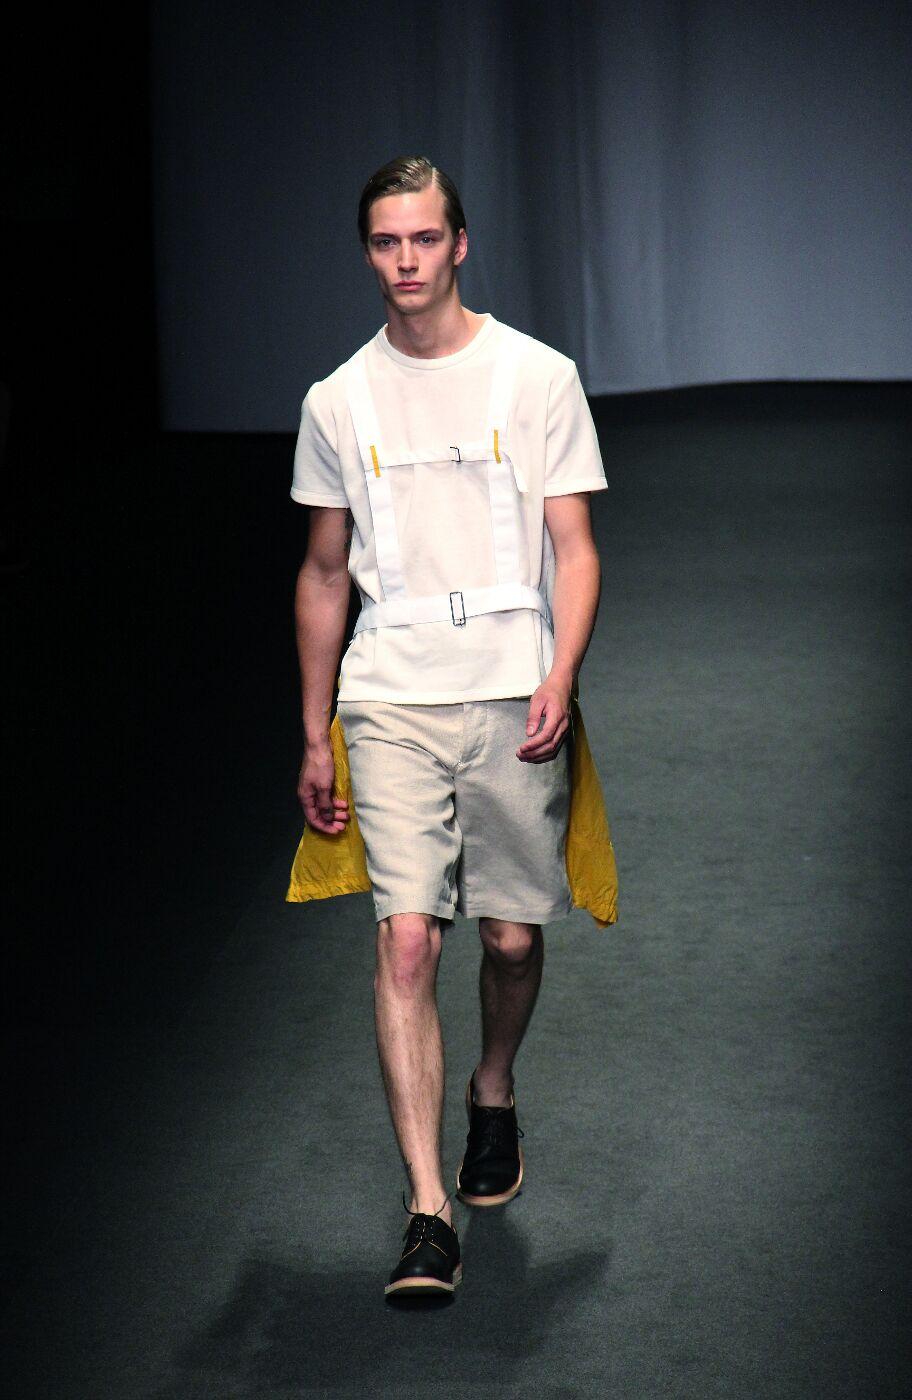 nicole-farhi-spring-summer-2012-men-collection-milano-fashion-week-2012-nicole-farhi-primavera-estate-nicole-farhi-fashion-show-catwalk-2012